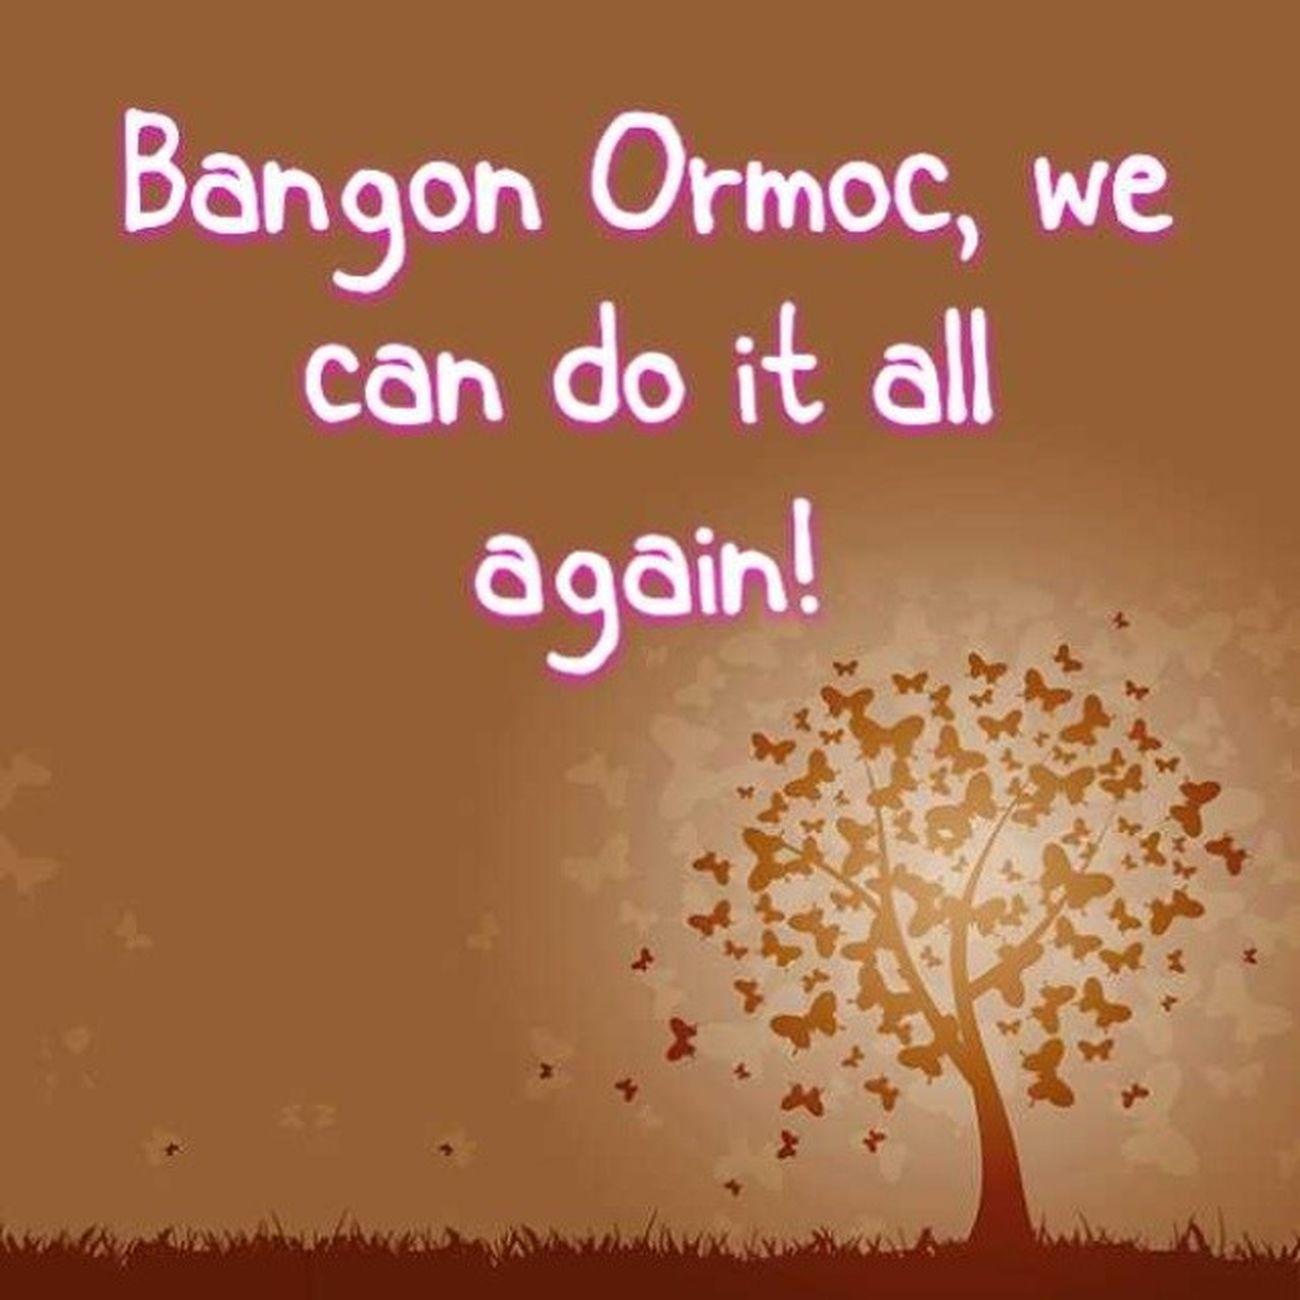 Bangonormoc OrmocCity Ormoc Tragedy typhoon typhoonyolanda leyte wecandoitagain riseormoc riseagain strong ormocanons